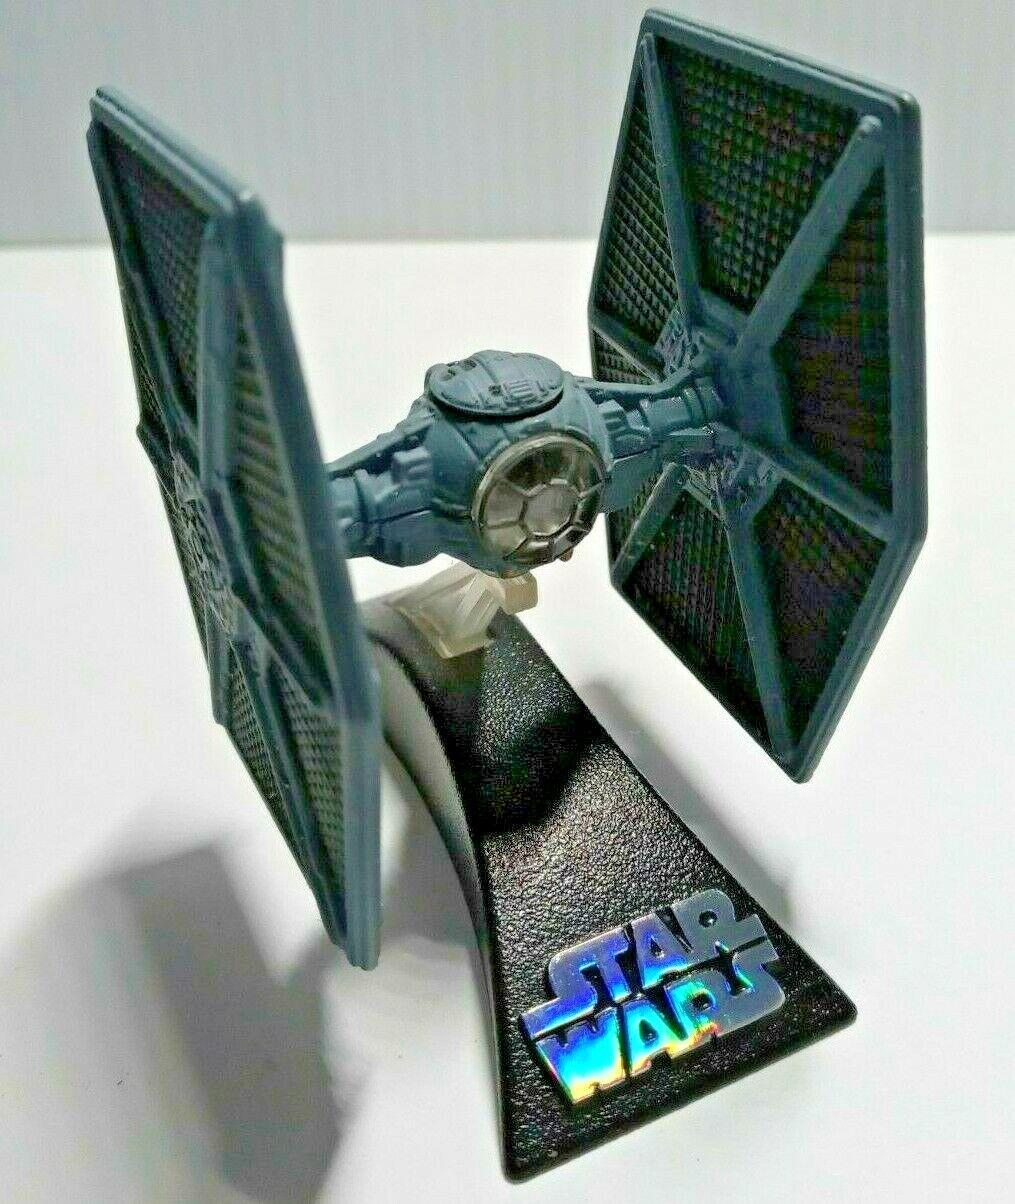 Titanium Series Star Wars 3 Inch Vehicles TIE Interceptor Hasbro 34684